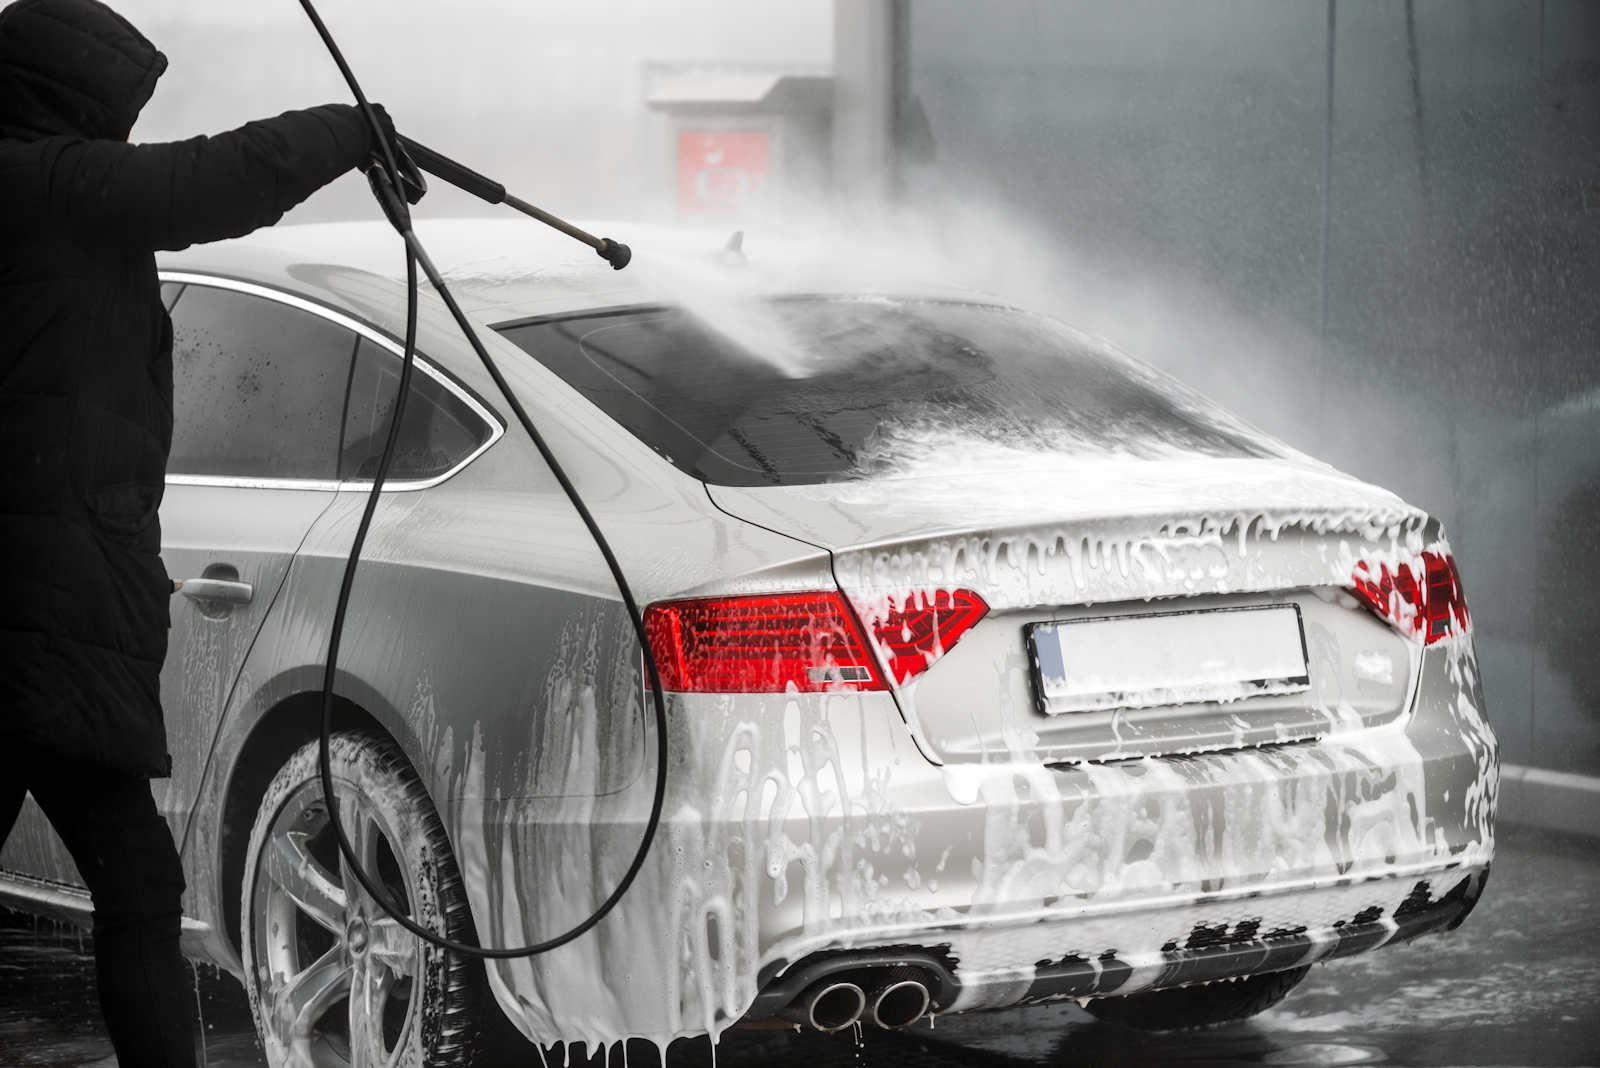 Star Car Wash of Ellenbrook